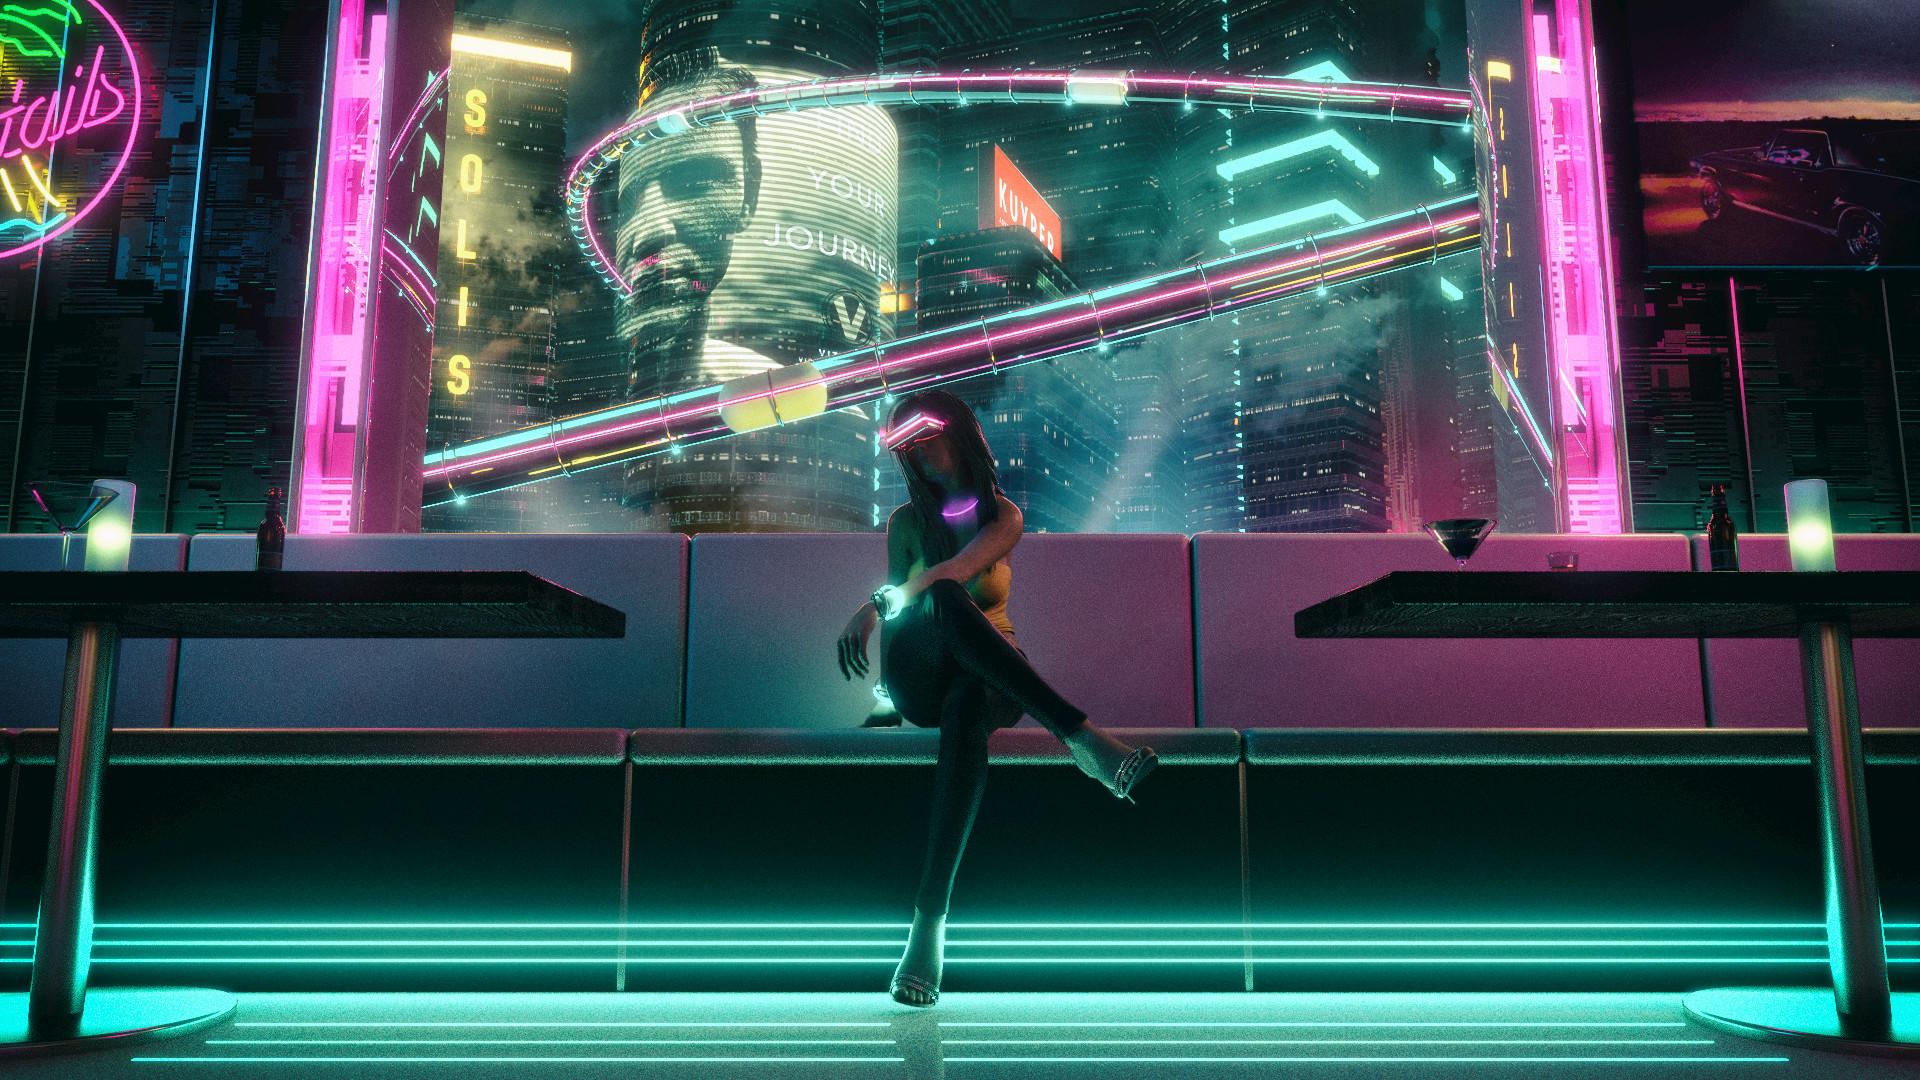 General 1920x1080 artwork digital digital art concept art synthwave Retrowave vaporwave night Nightclub OutRun Blade Runner skyscraper table couch neon neon glow neon lights lights poster cocktails VR Headset David Legnon